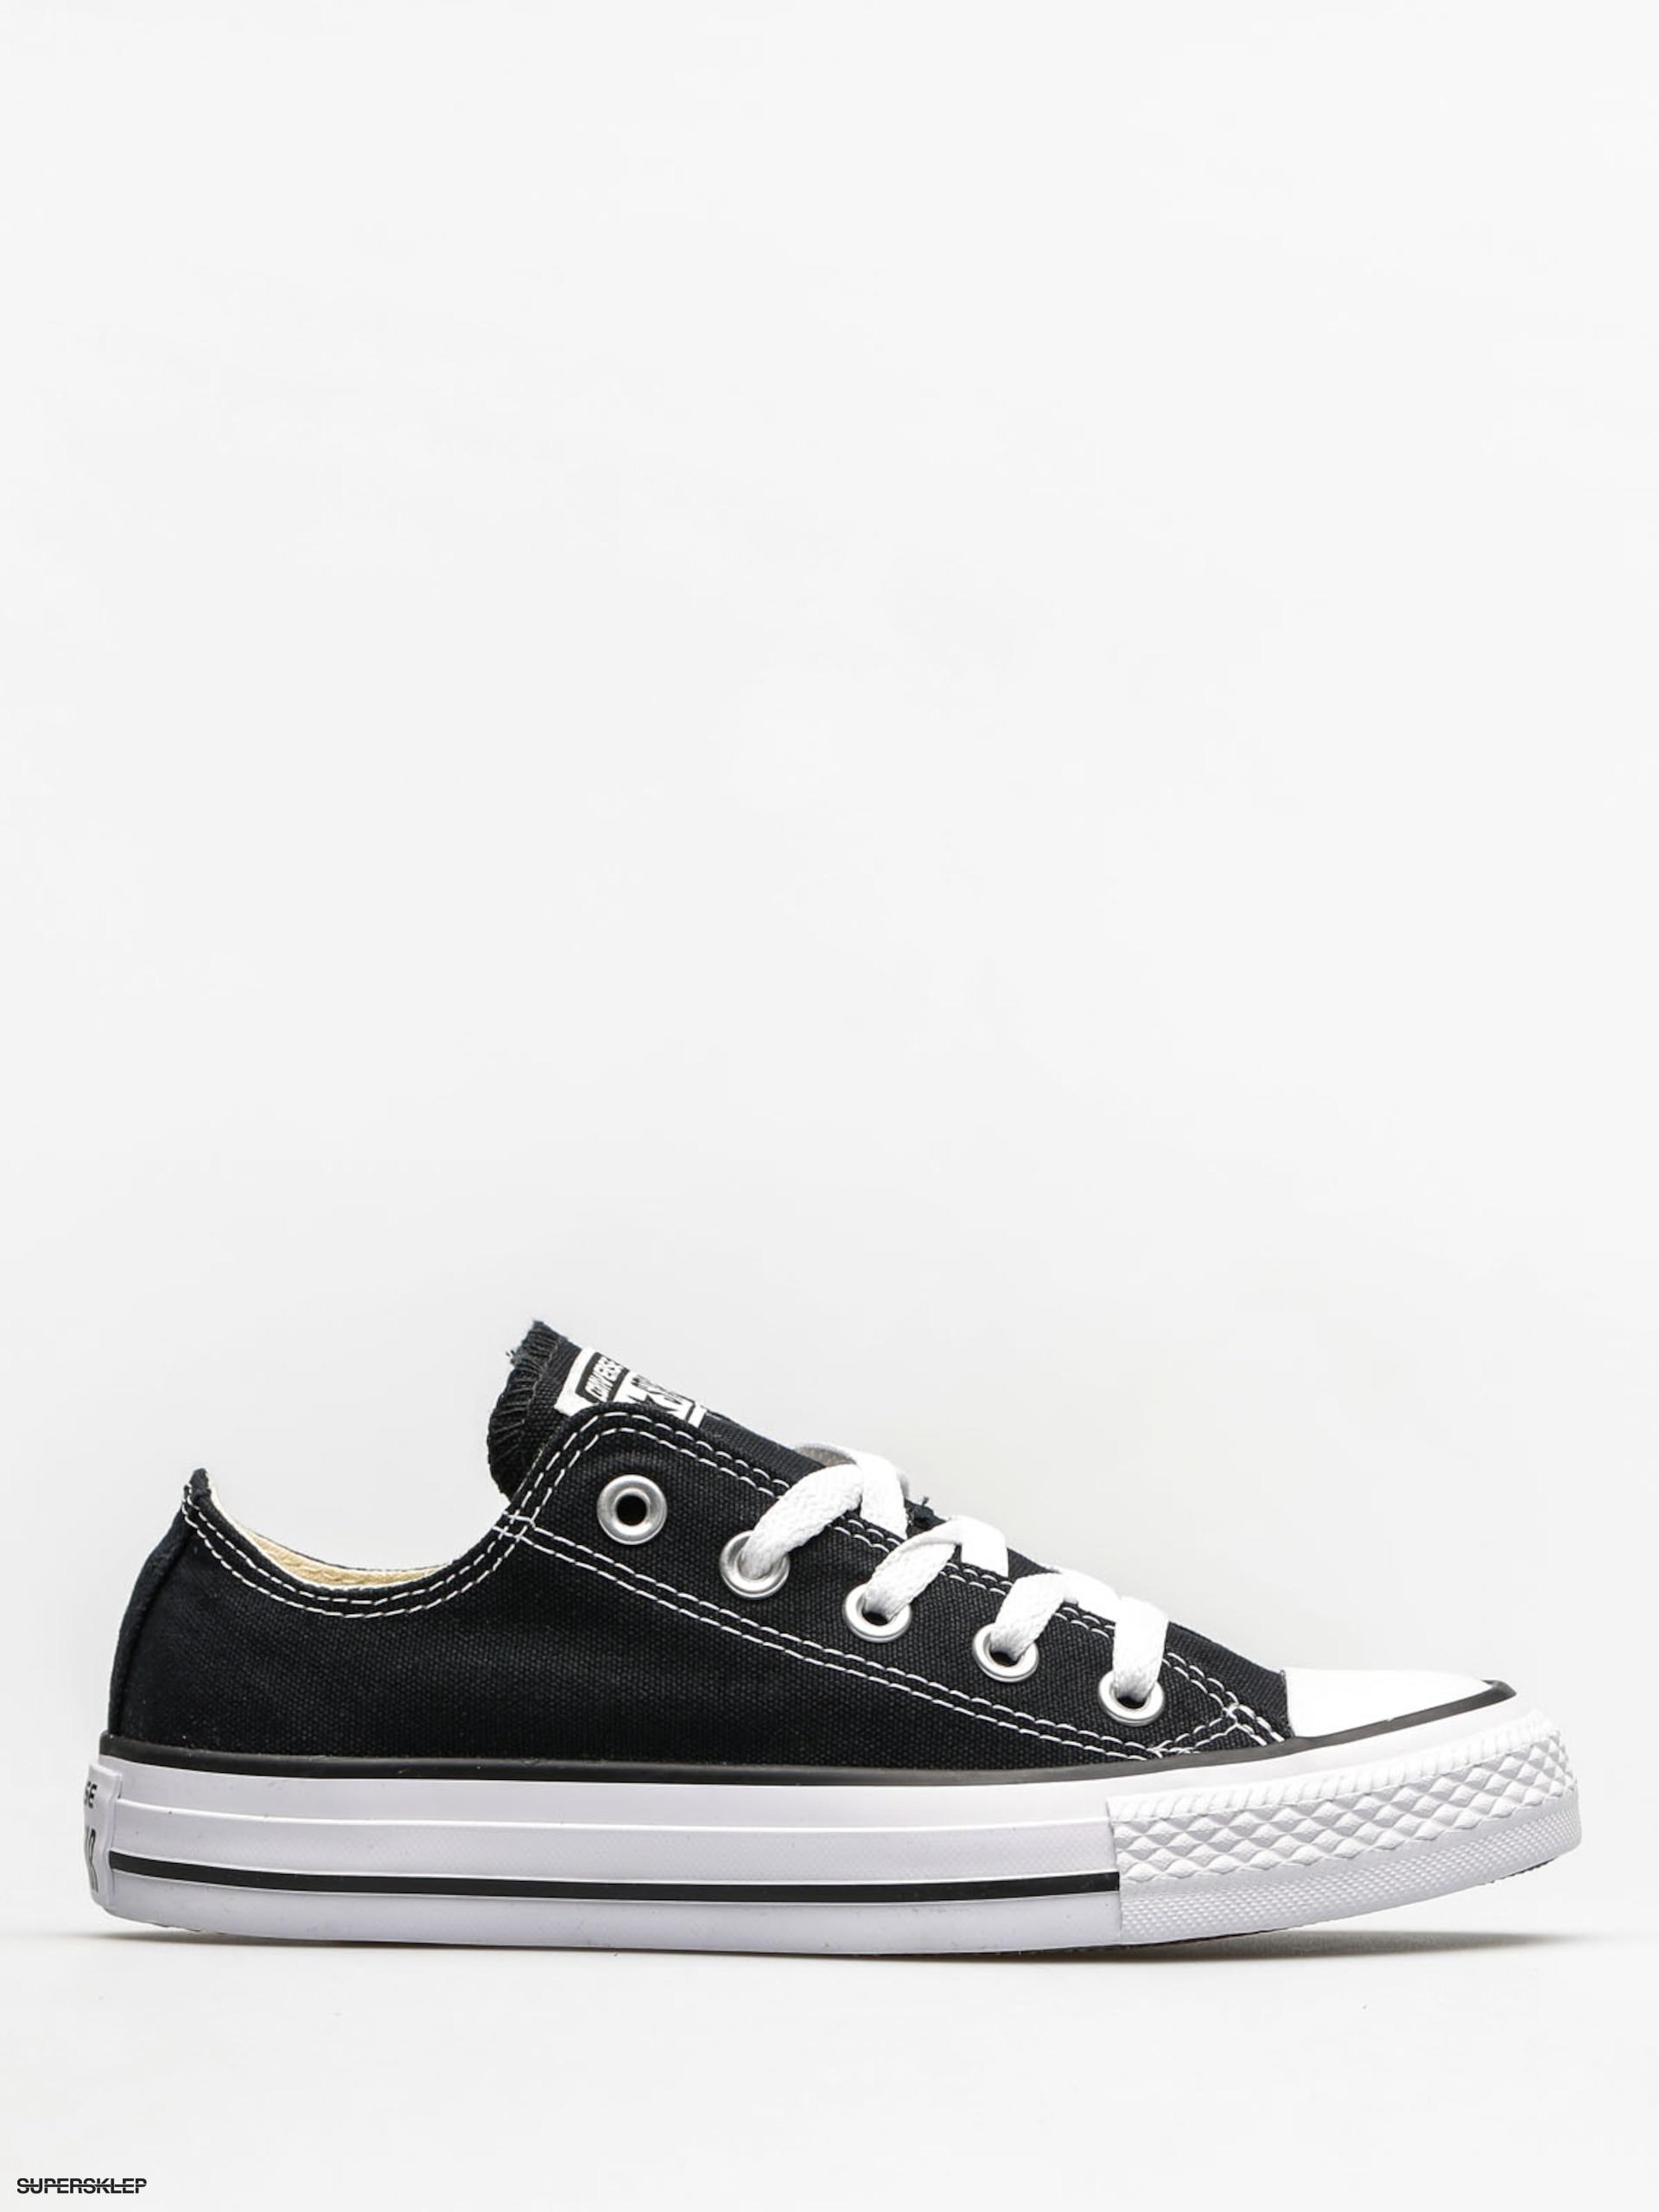 Tenisky Converse Chuck Taylor All Star OX (black) 8c5a3cbb014